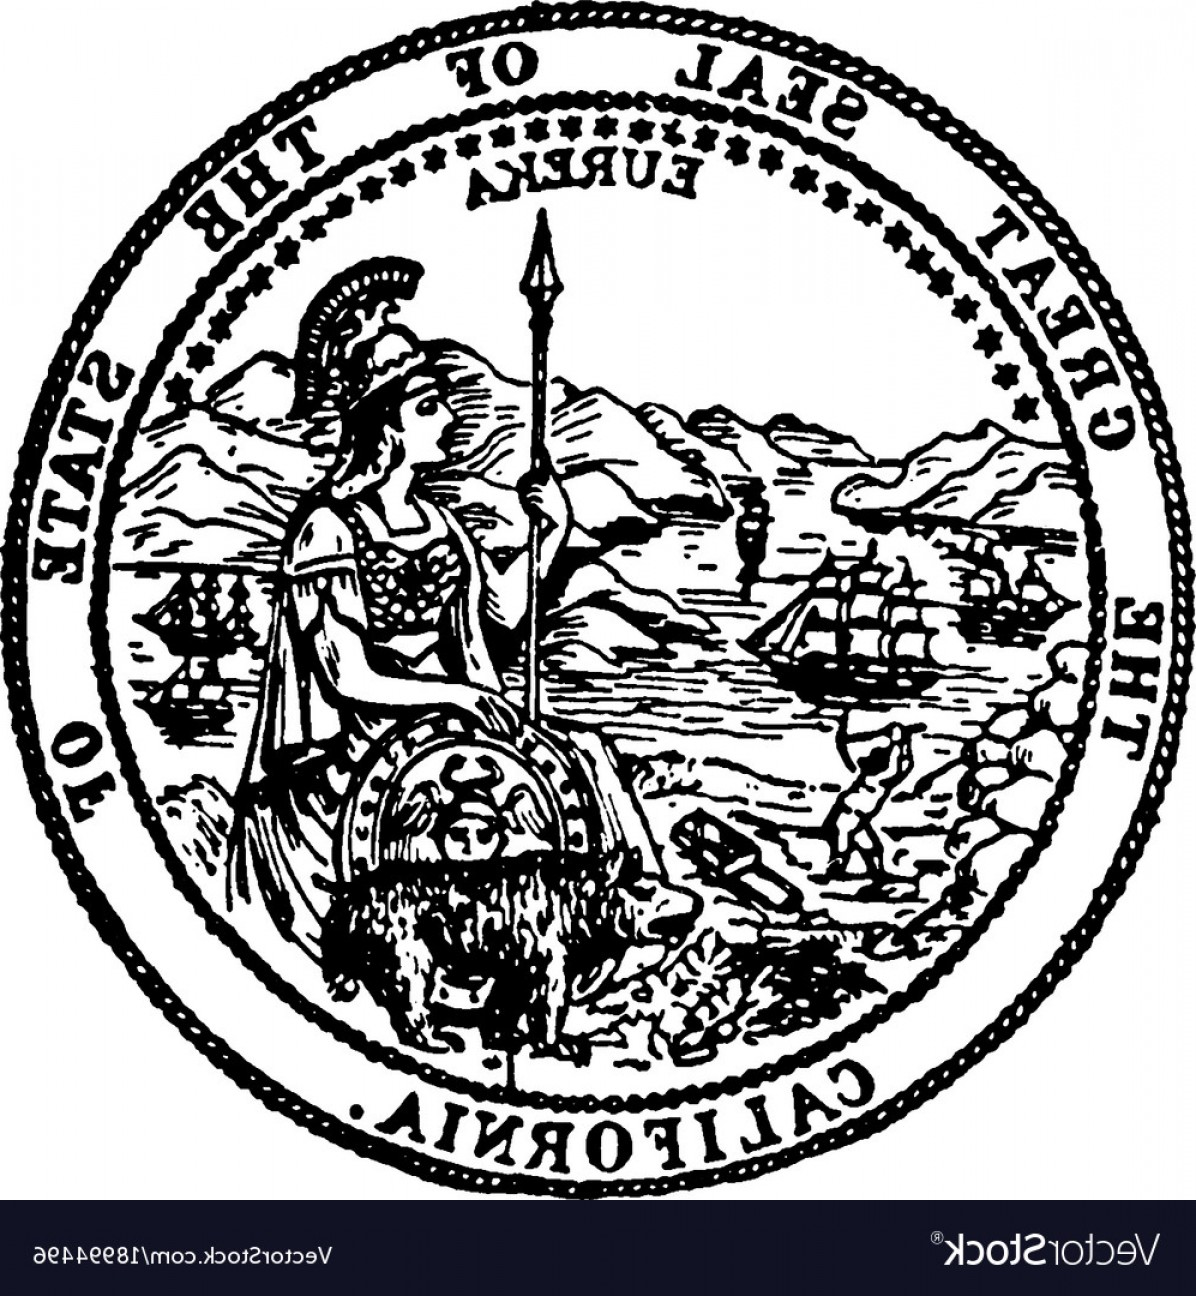 1196x1296 State Of Nebraska State Seal Vector Geekchicpro